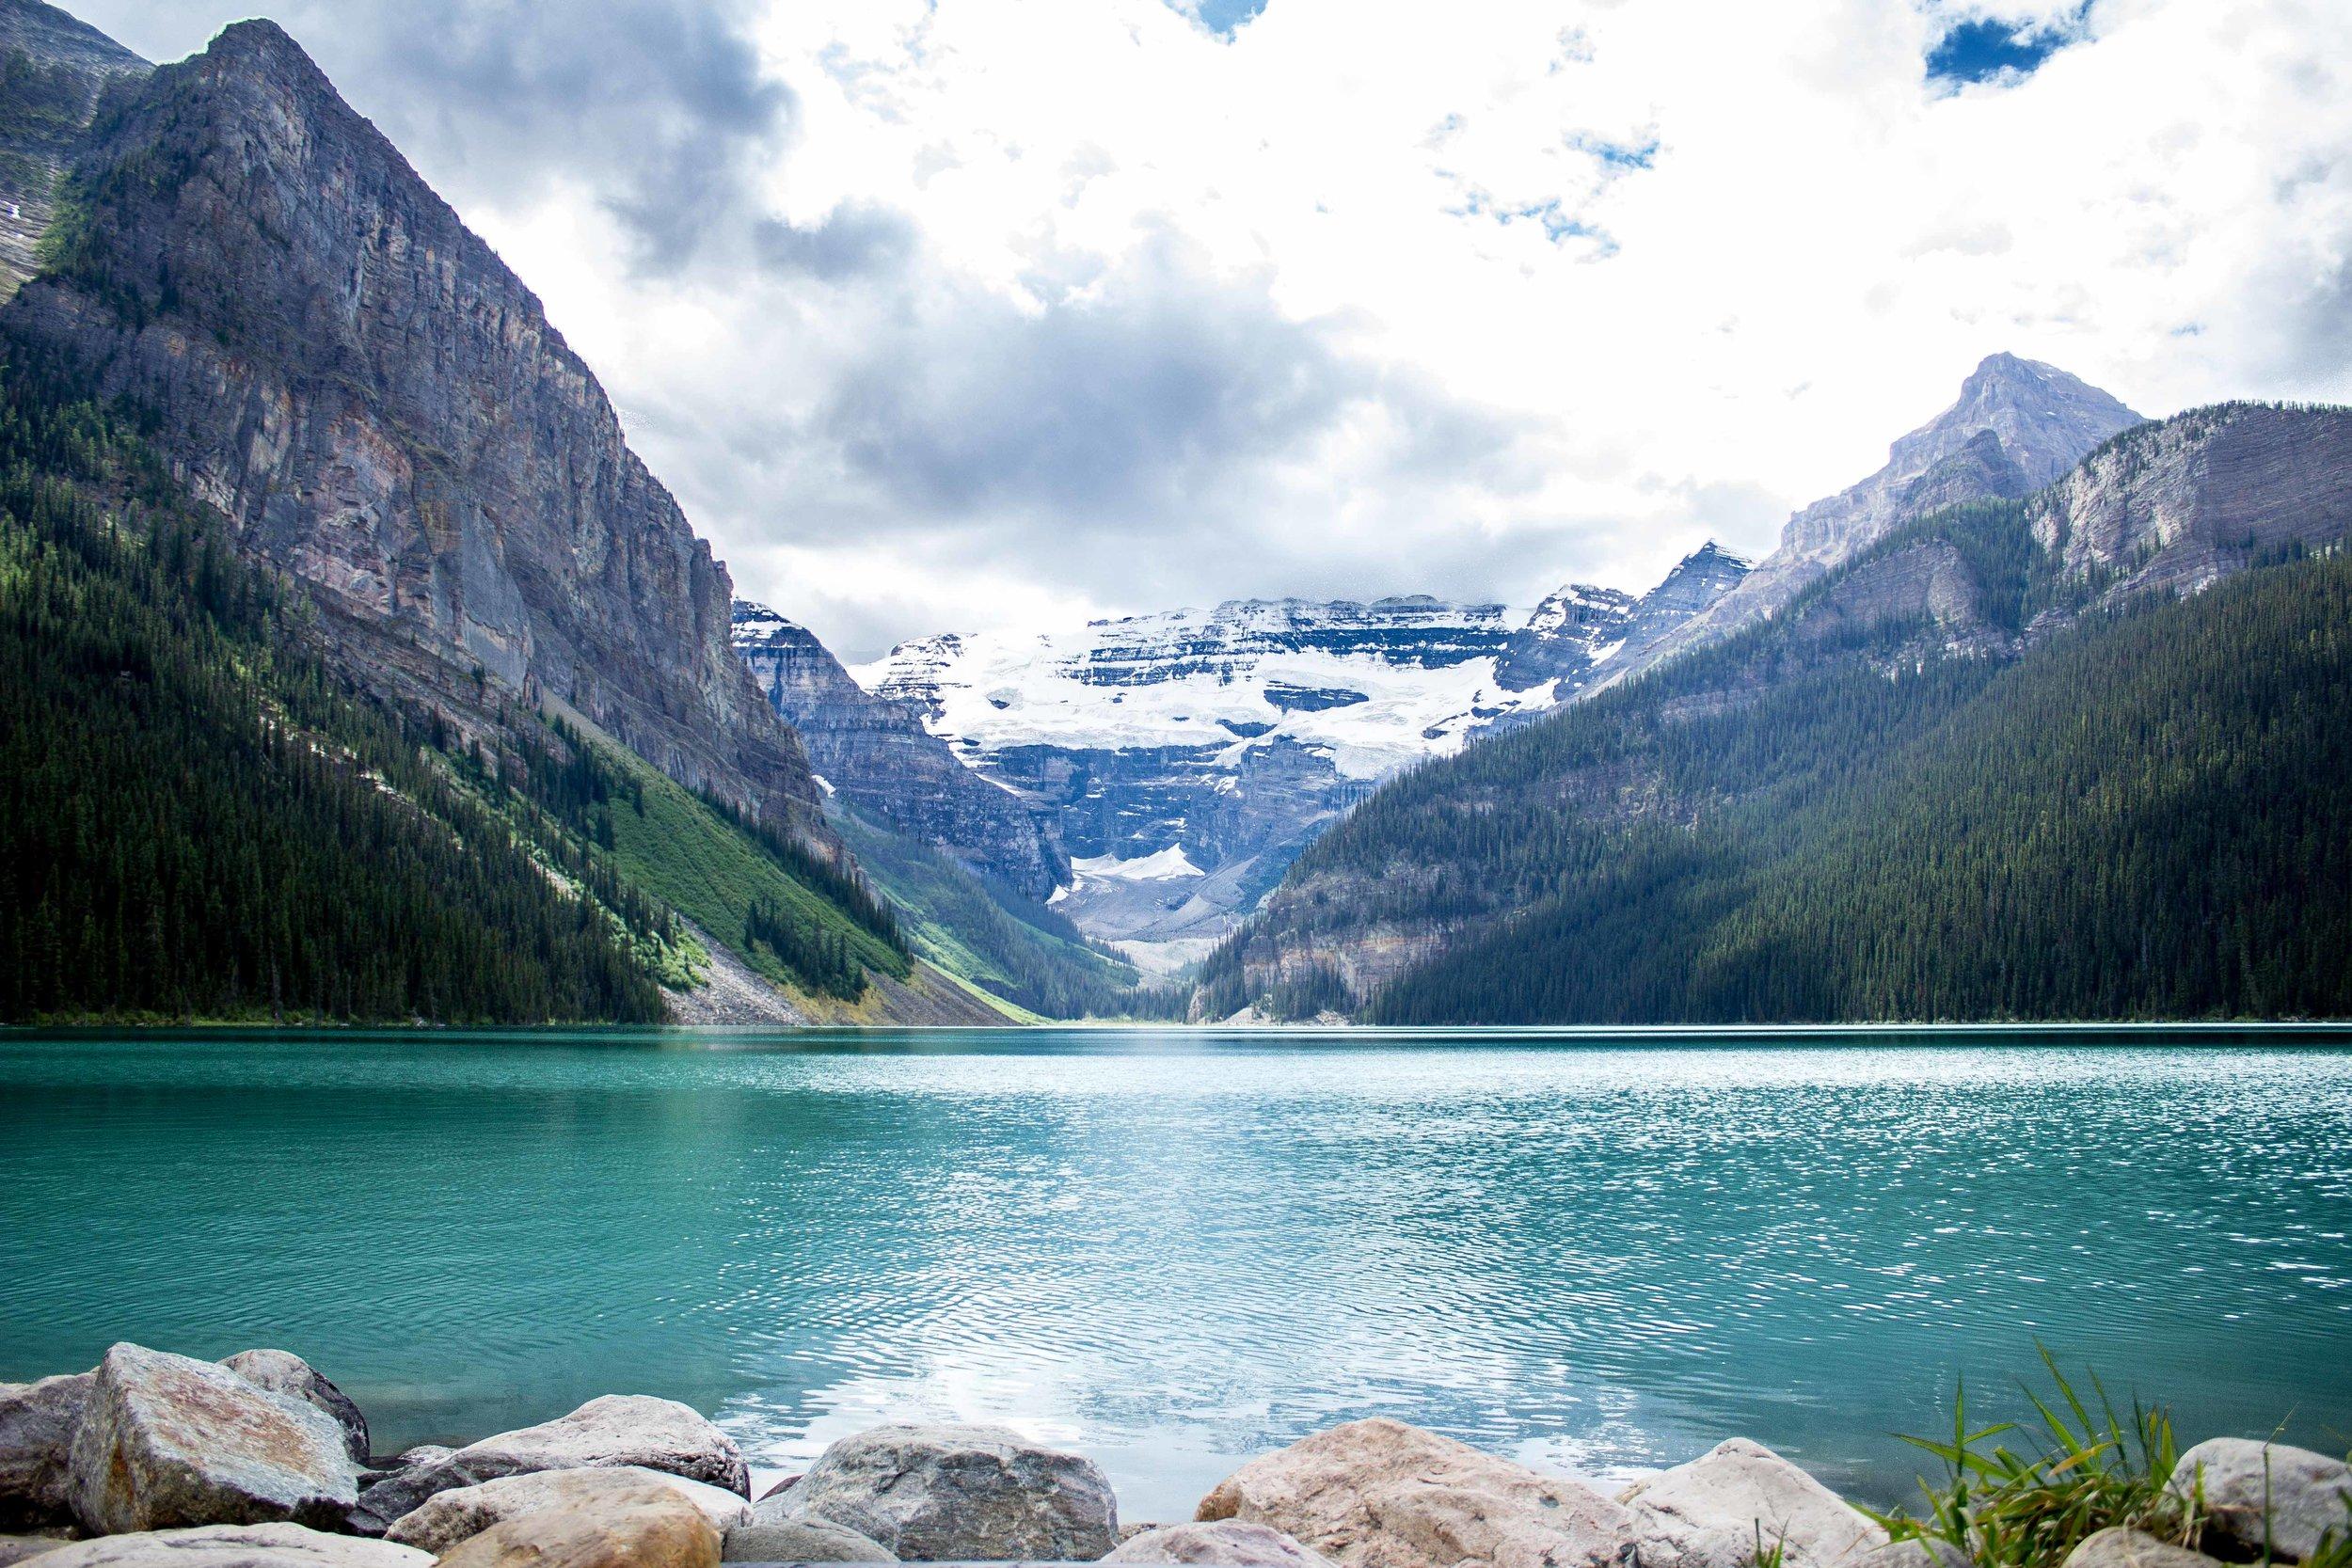 Landscapes - Nature's treasures